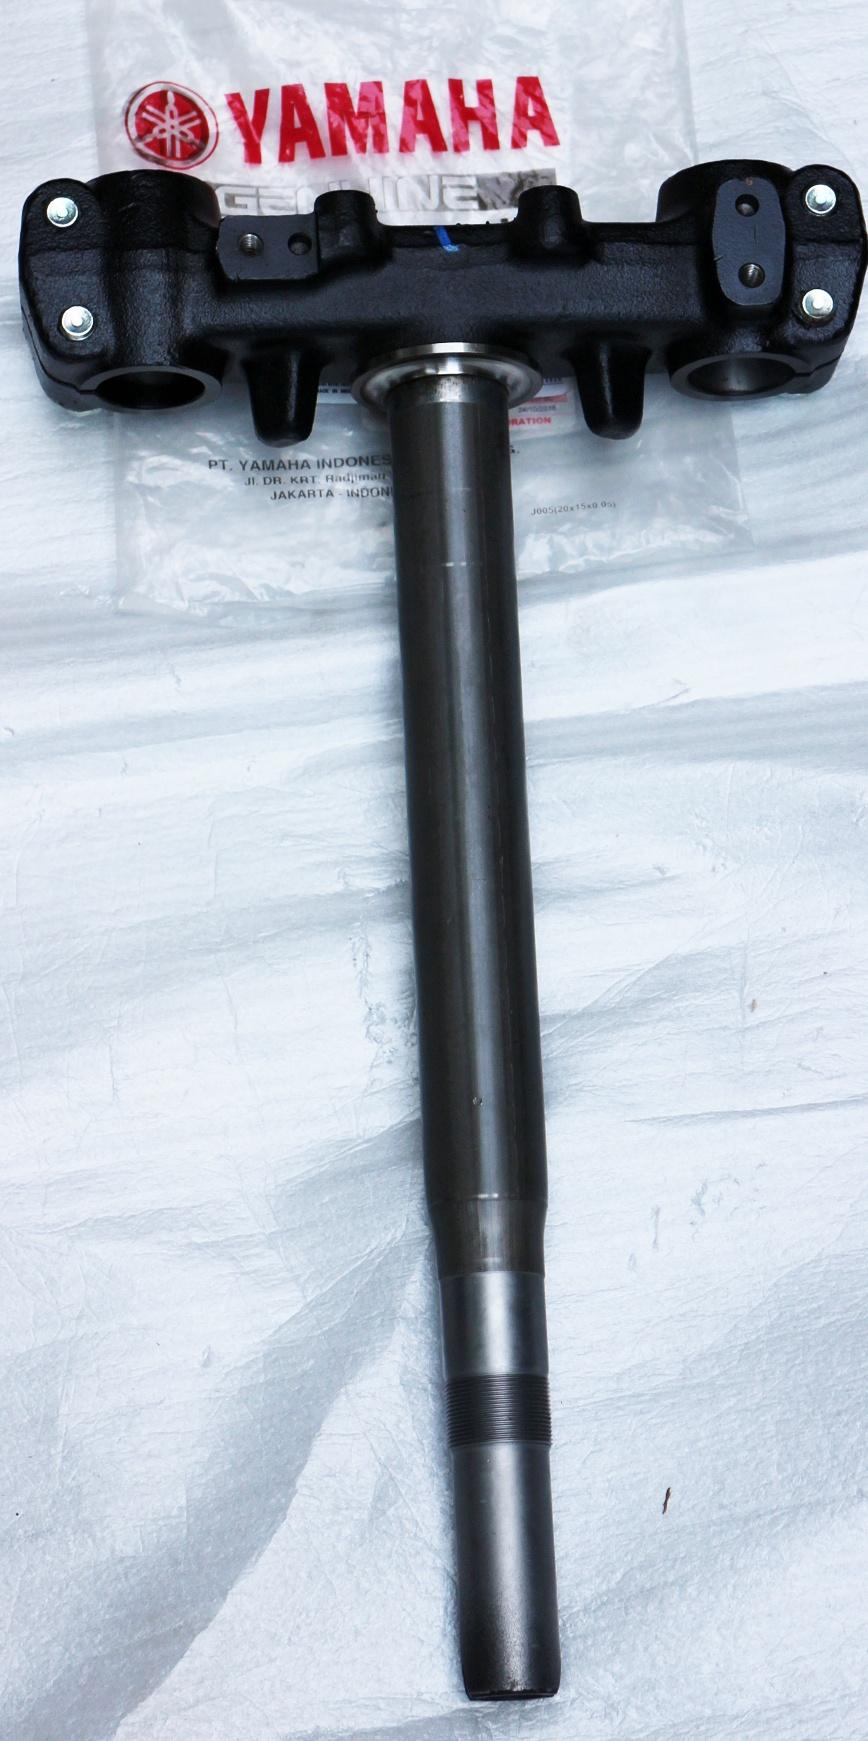 Original Yamaha Under Bracket Comp (t-Post) For Mio Sporty, Soul By Jca Motorshop.